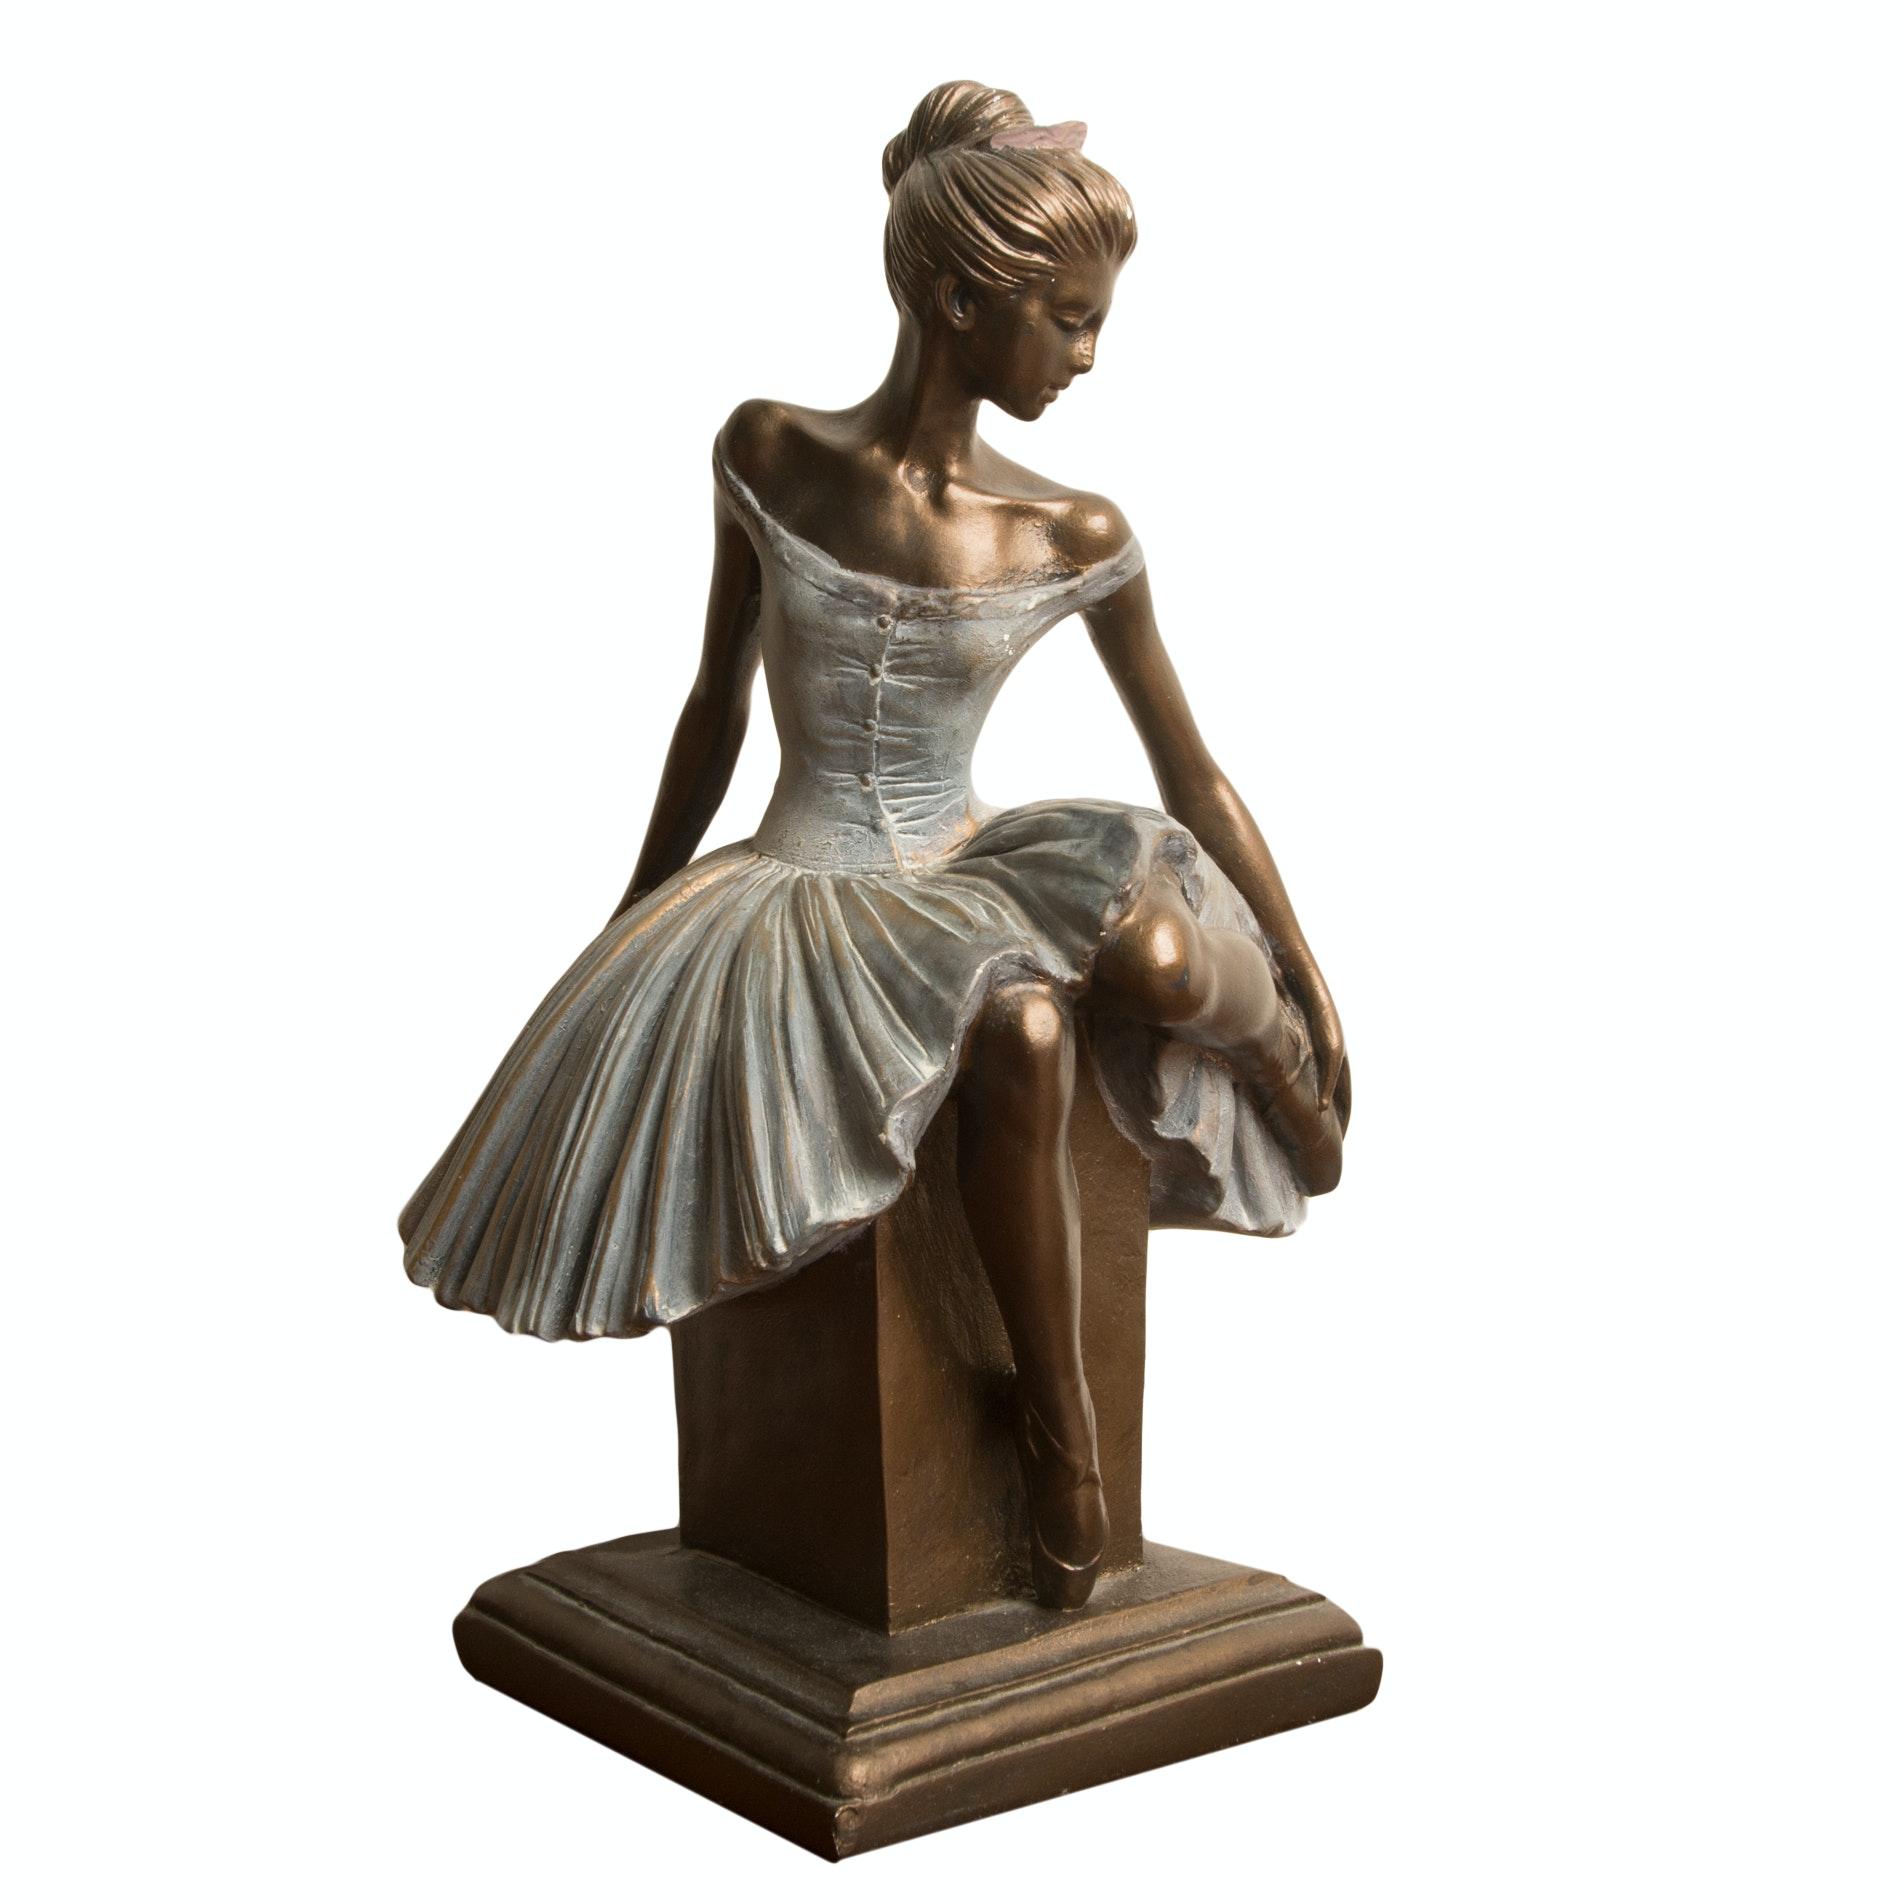 Sergey Eylanbekov Ballerina Reproduction Sculpture by Alva Studios after Edgar Degas